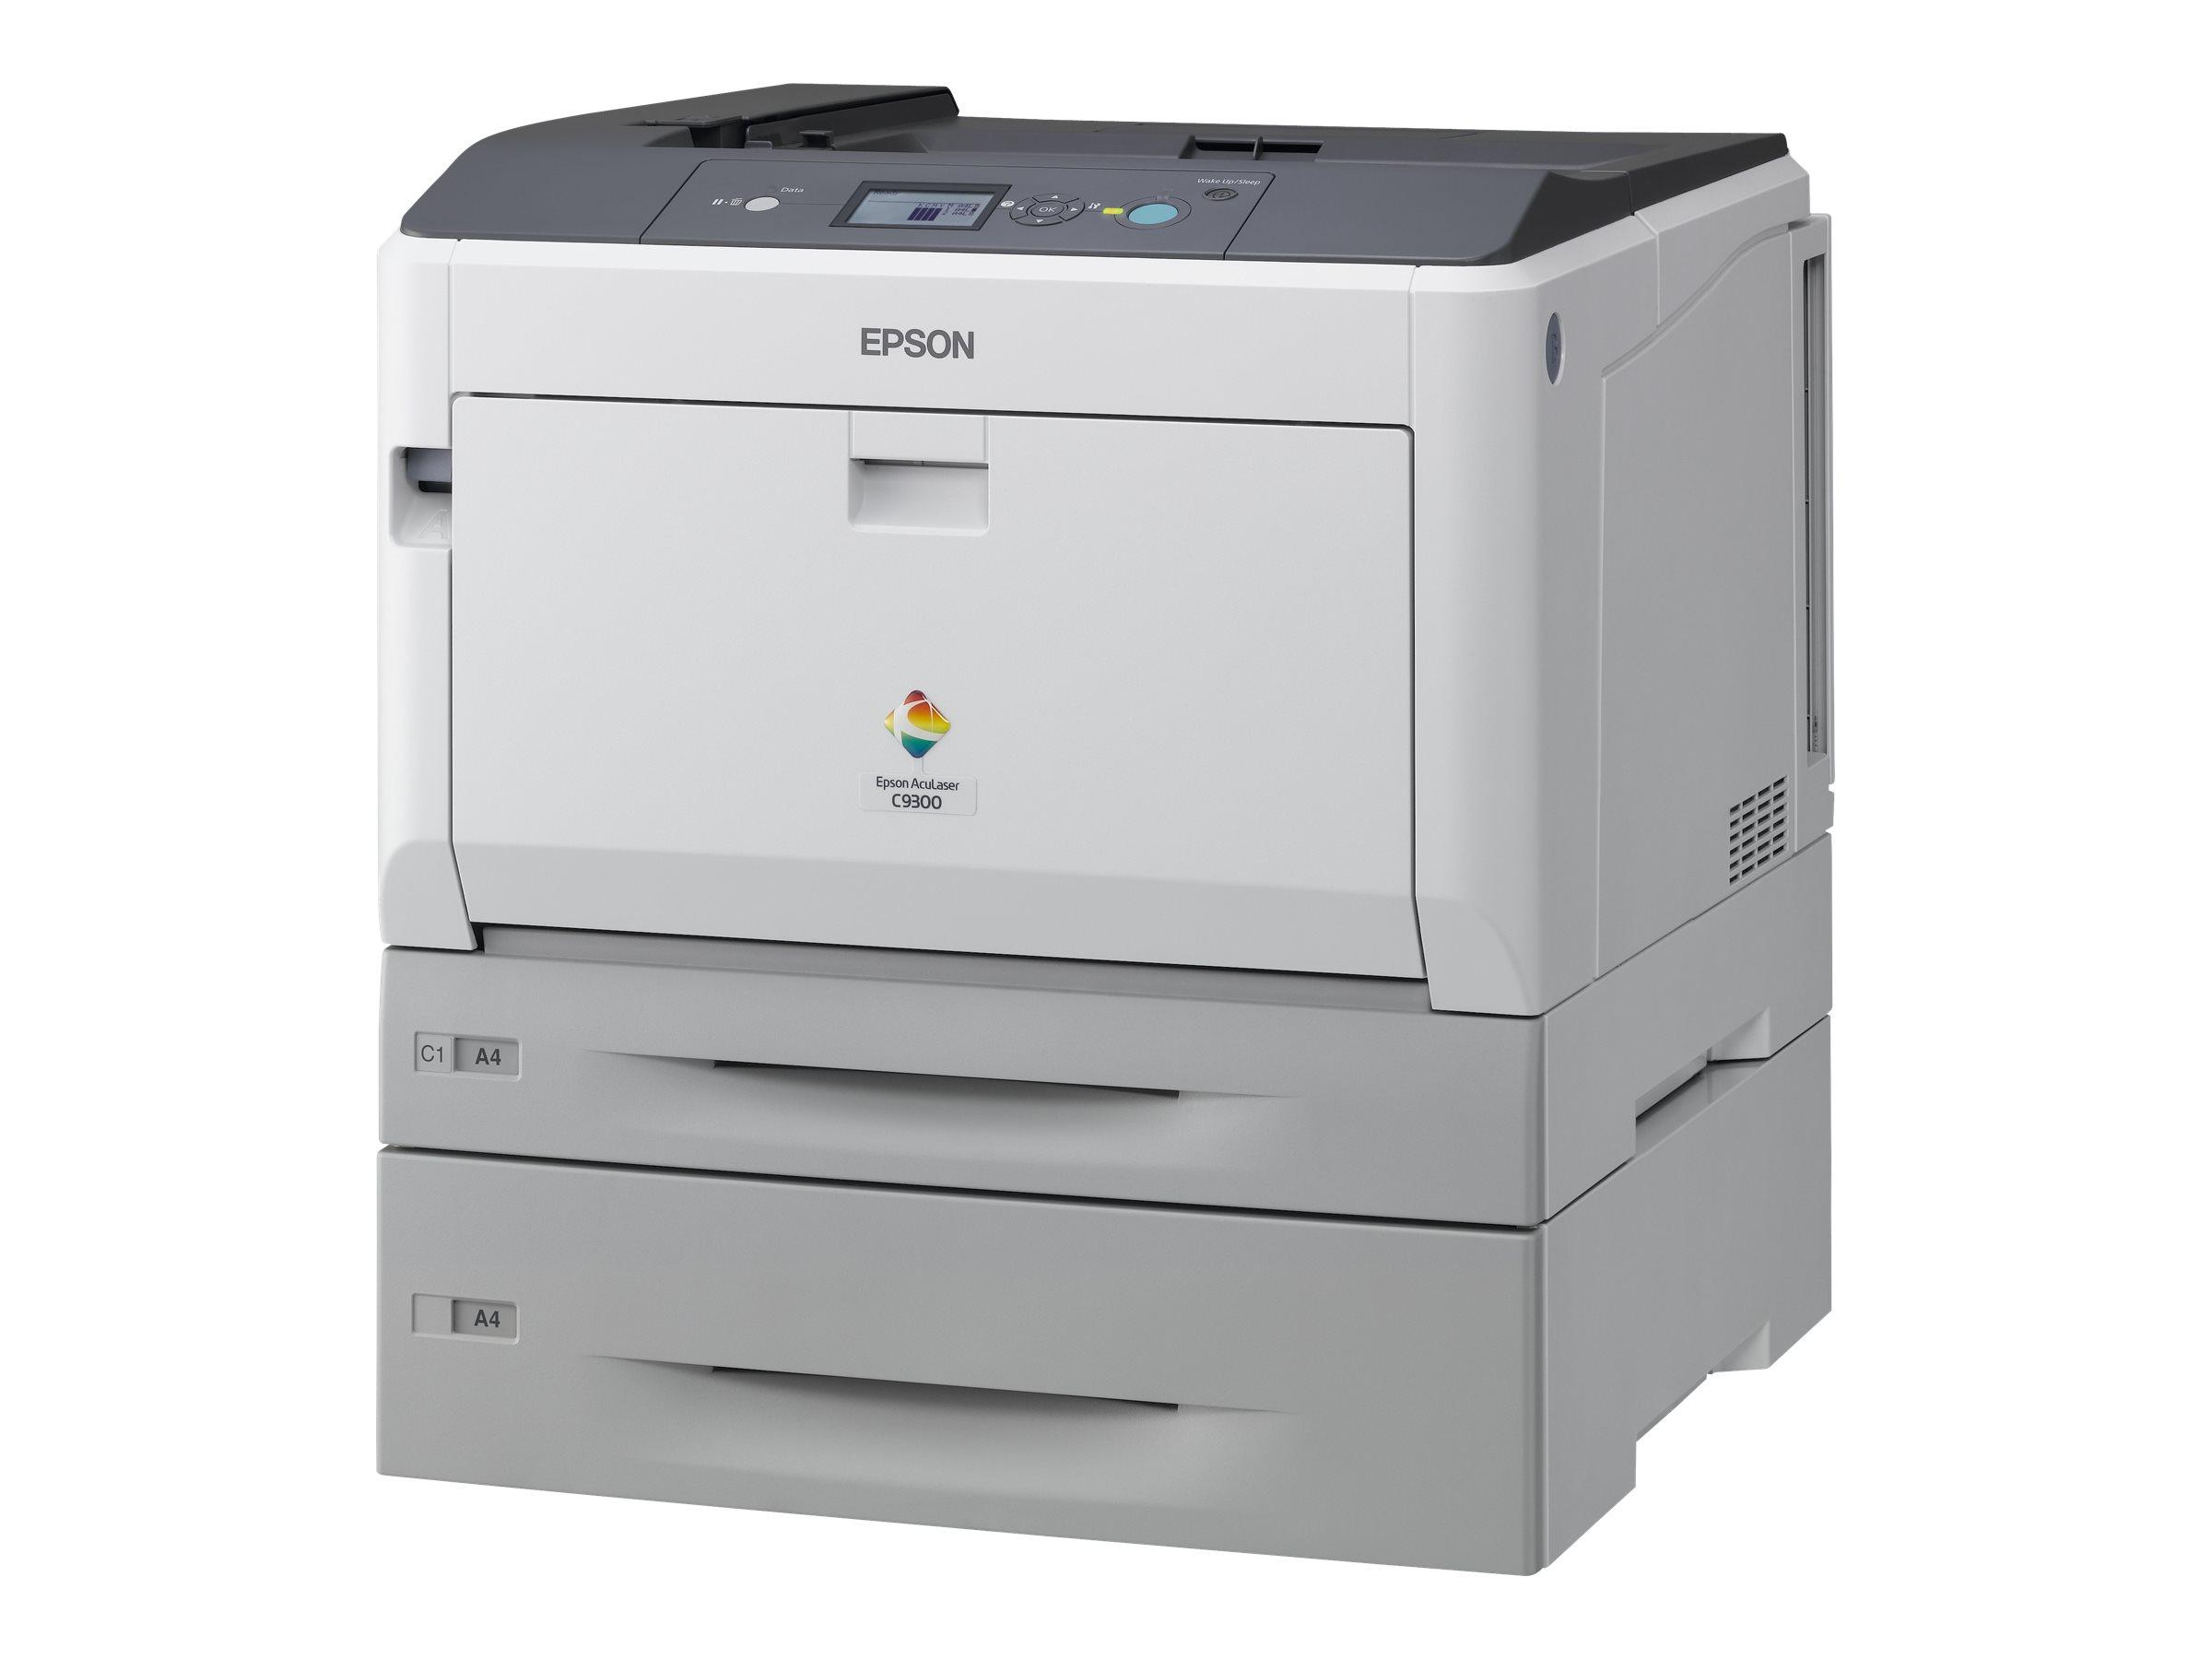 Epson AcuLaser C9300DTN - Drucker - Farbe - Duplex - Laser - A3/Ledger